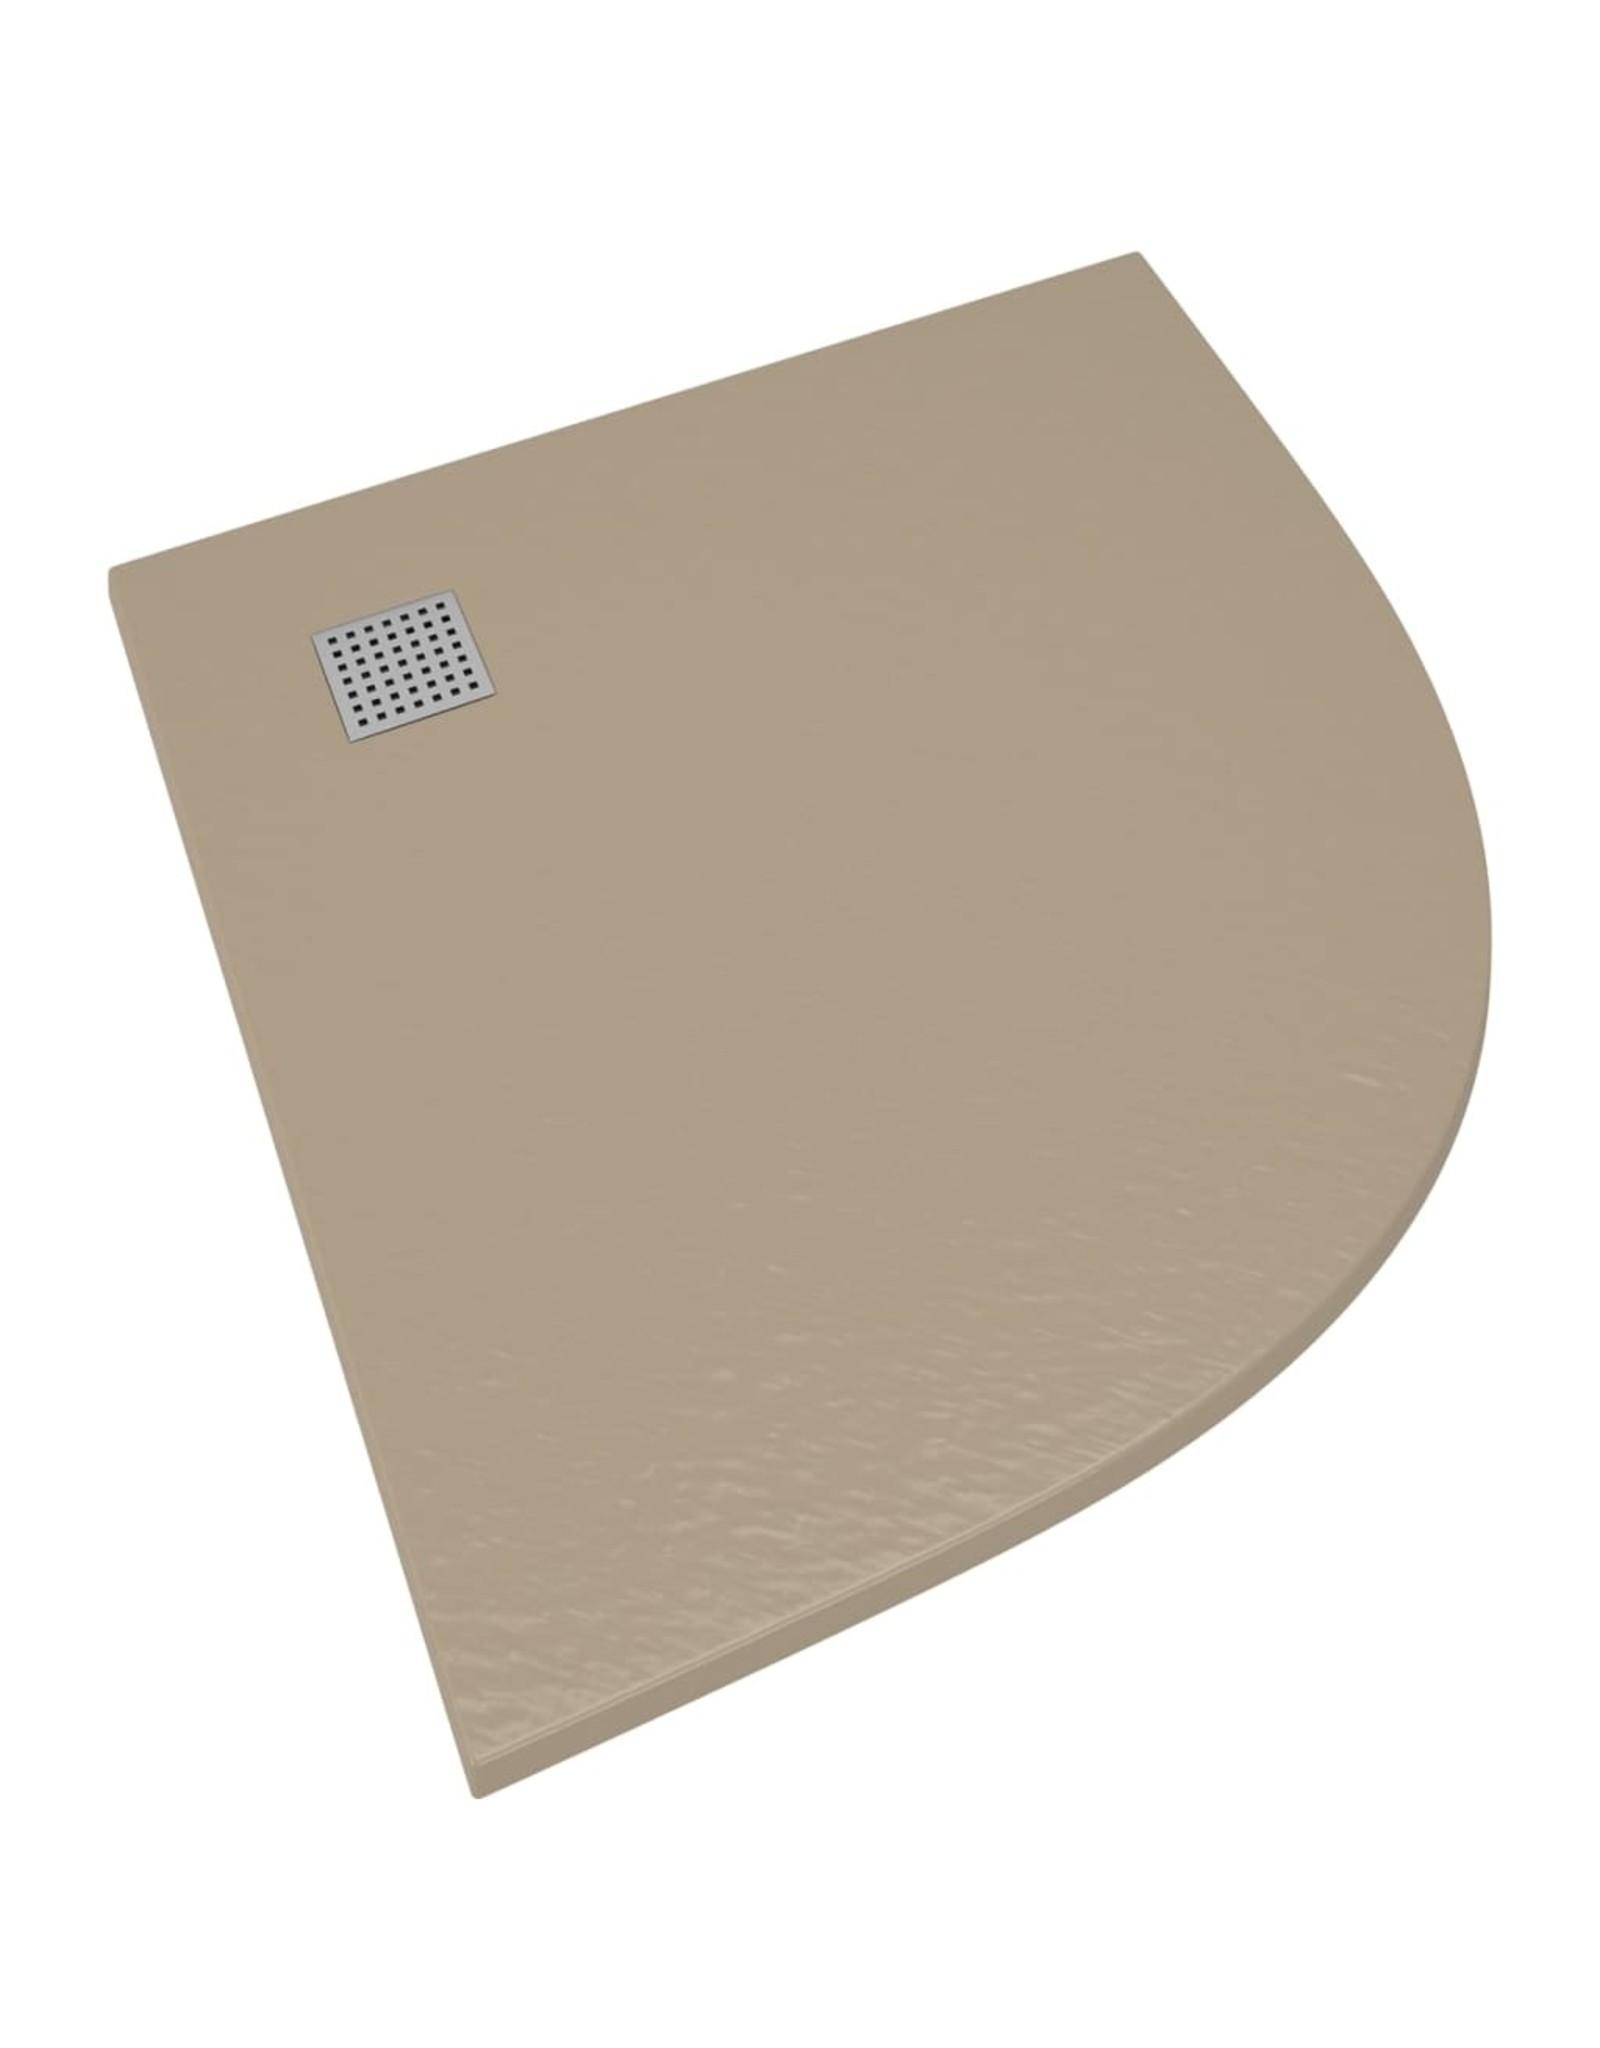 Douchebak 90x90 cm SMC bruin